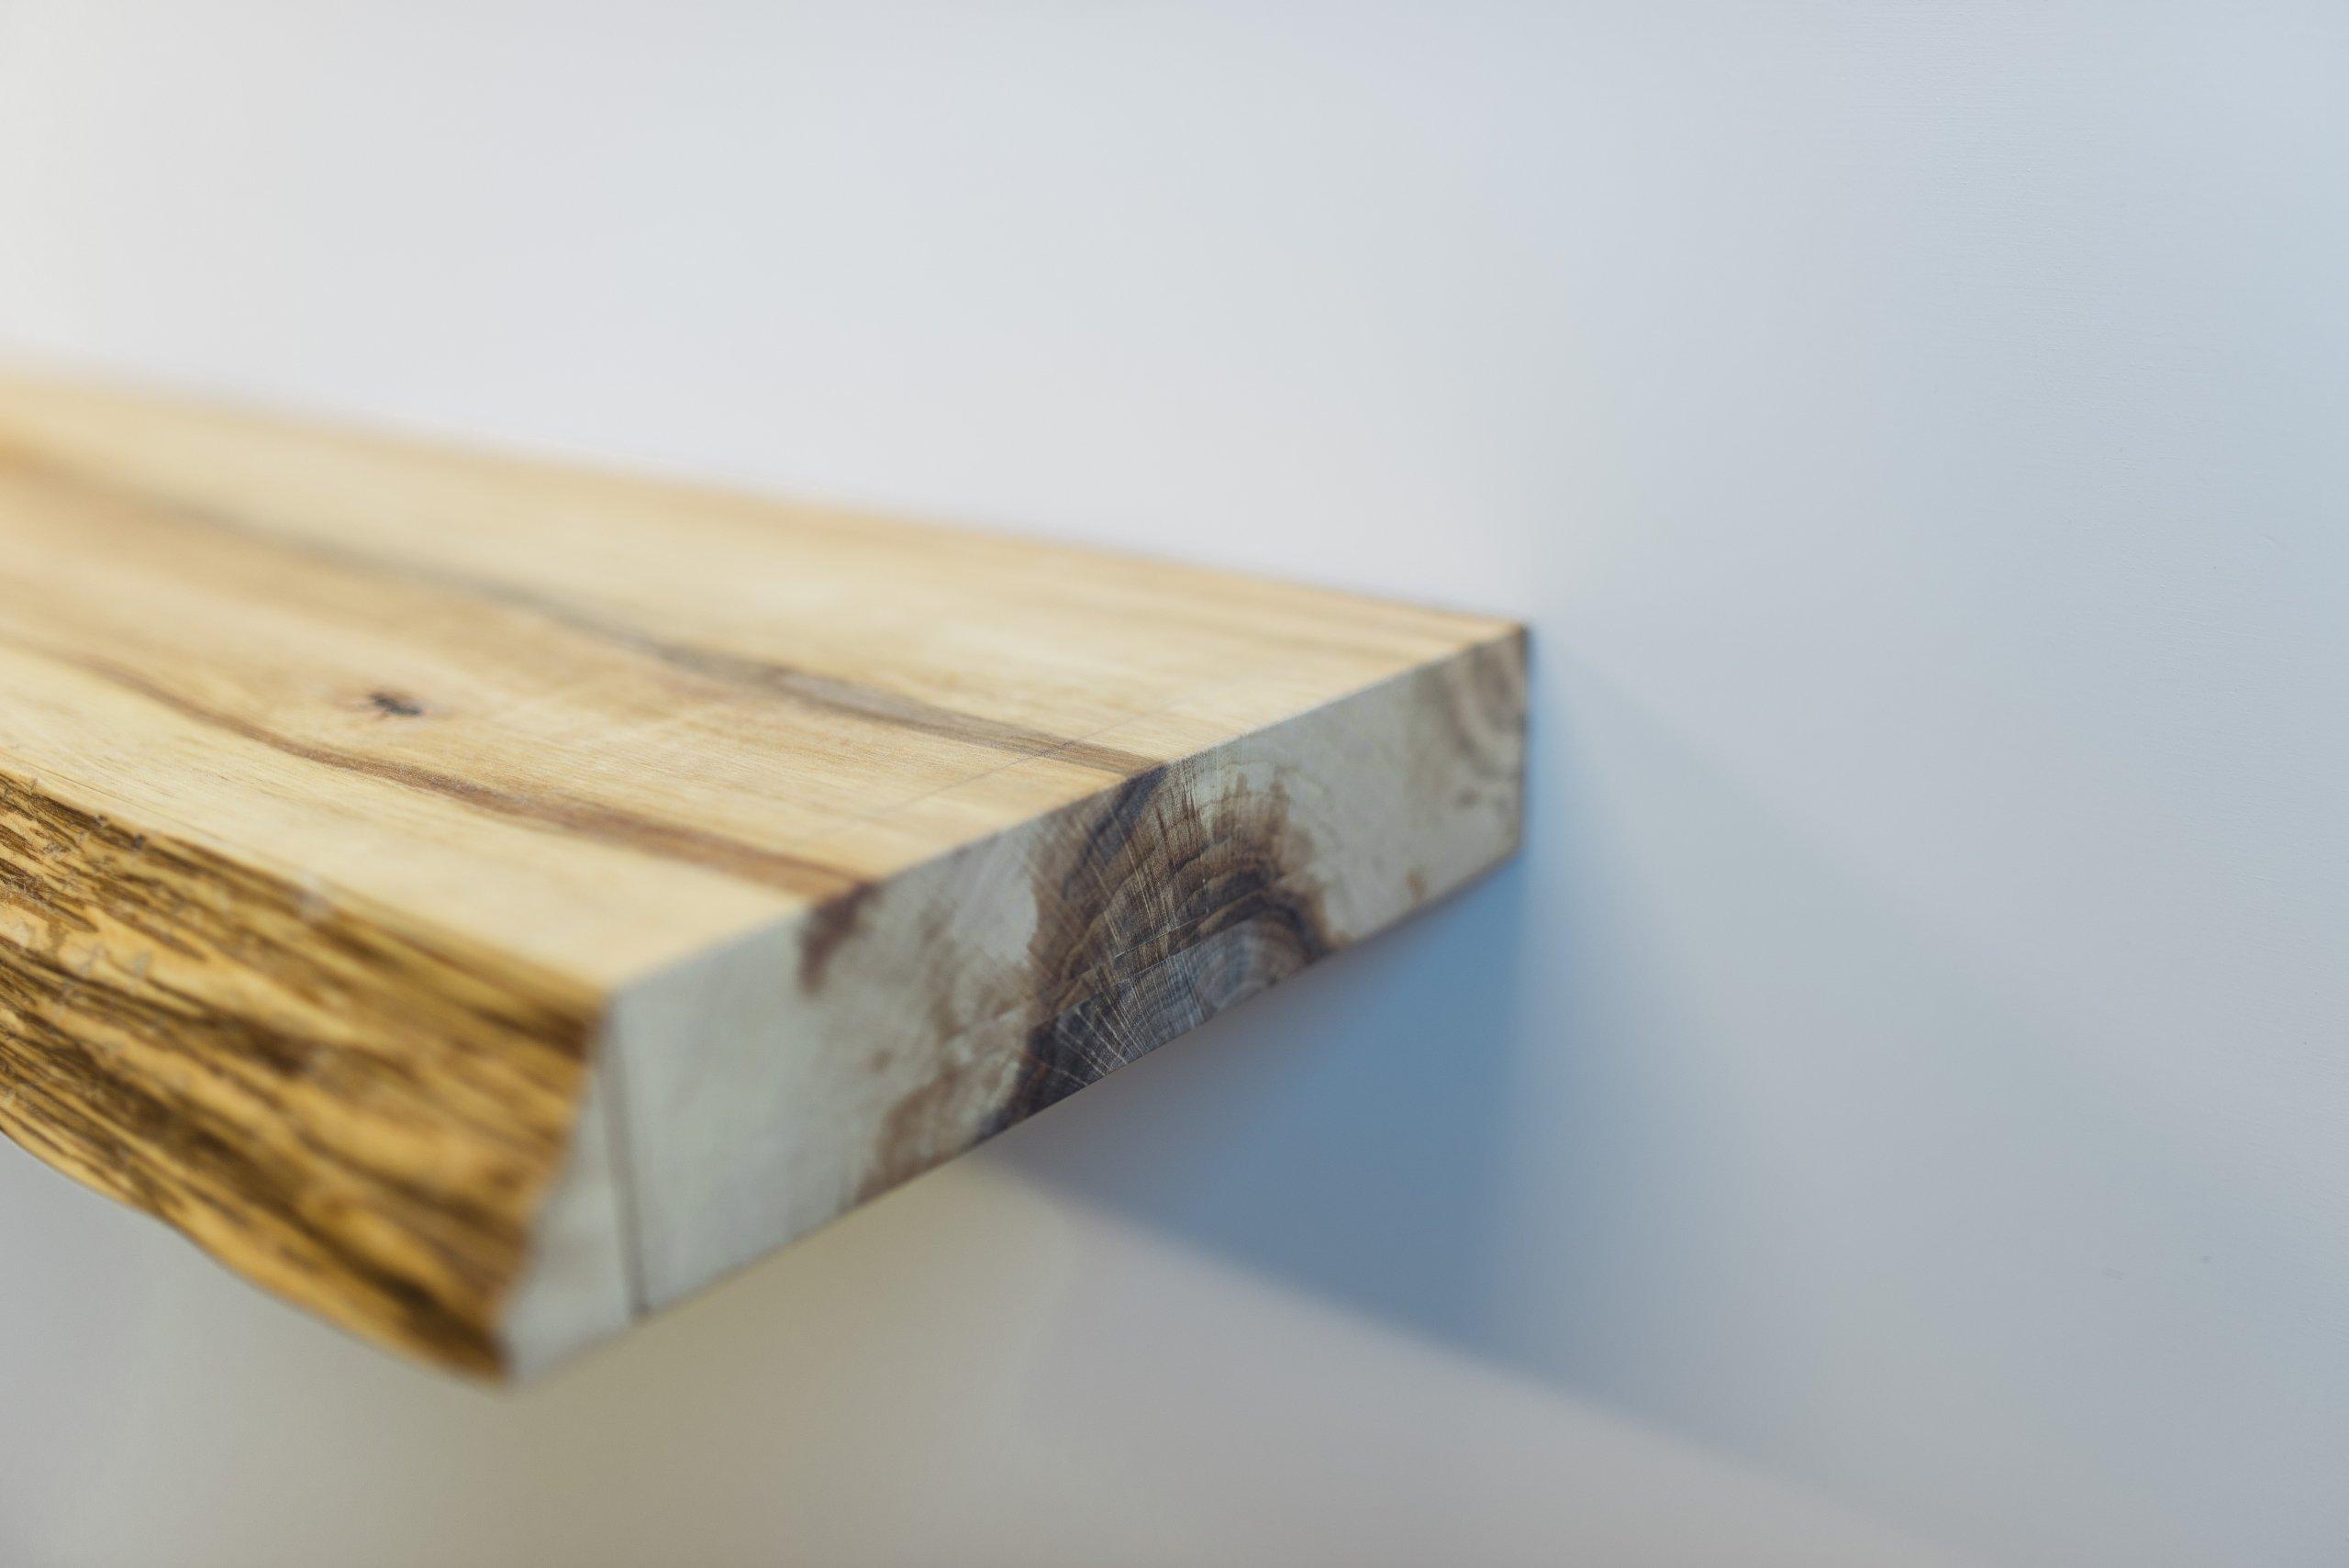 la planque steenbeuk